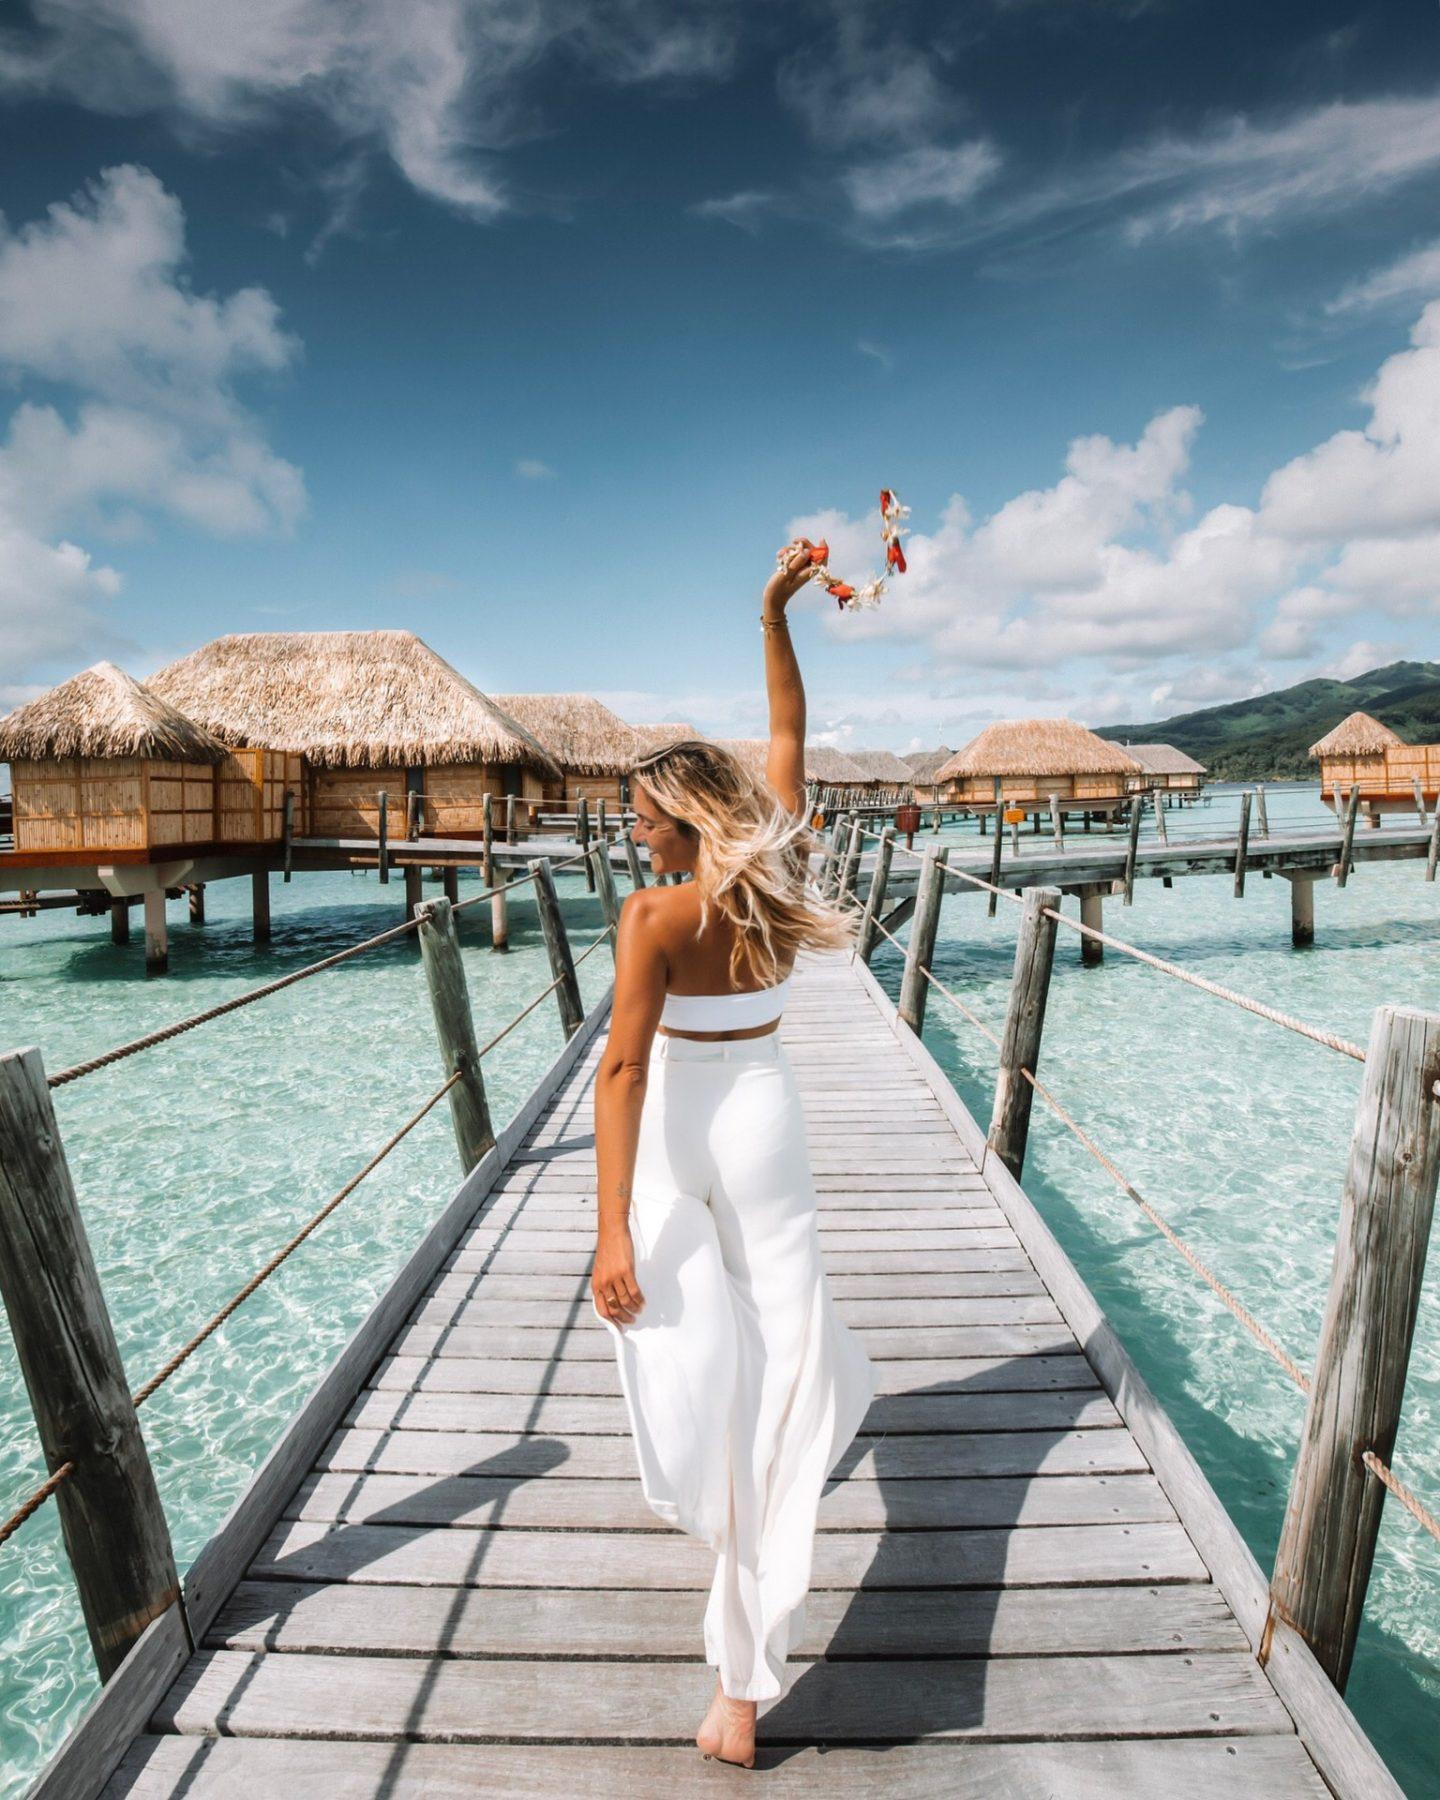 Visiter Tahiti - Blondie Baby blog voyages et mode